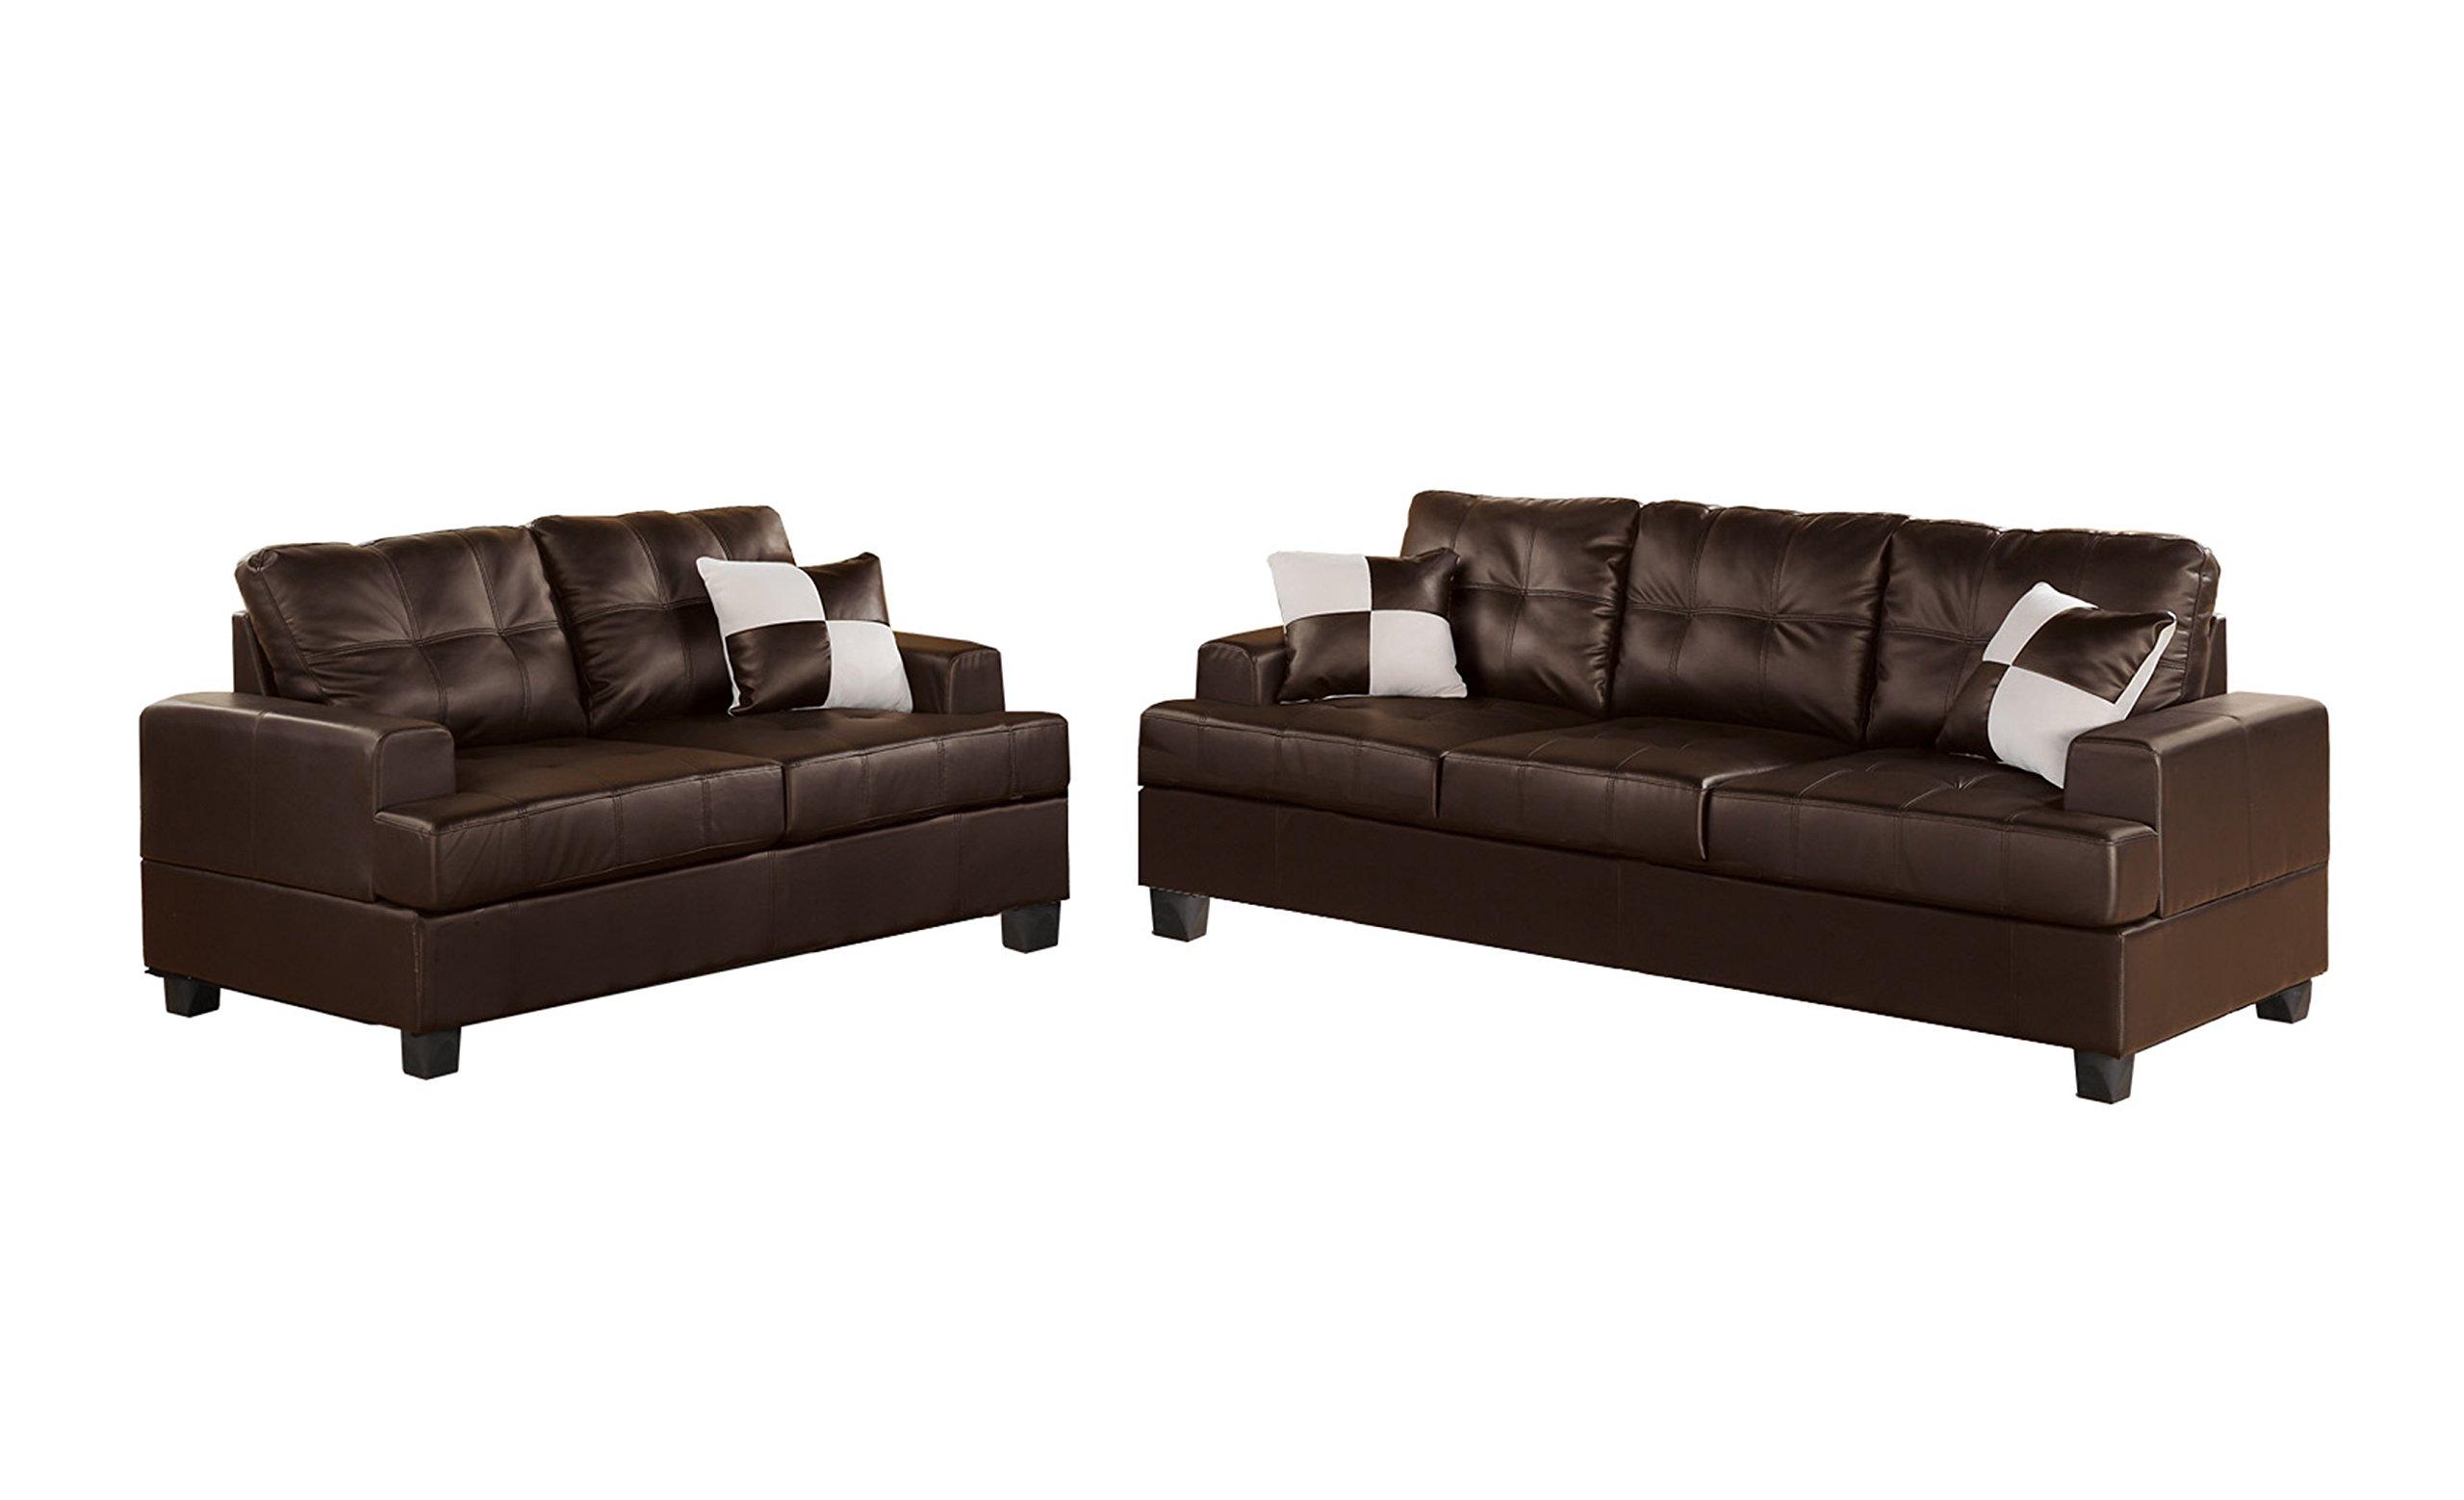 Poundex Bobkona Sherman Bonded Leather 2-Piece Sofa and Loveseat Set, Espresso by Poundex